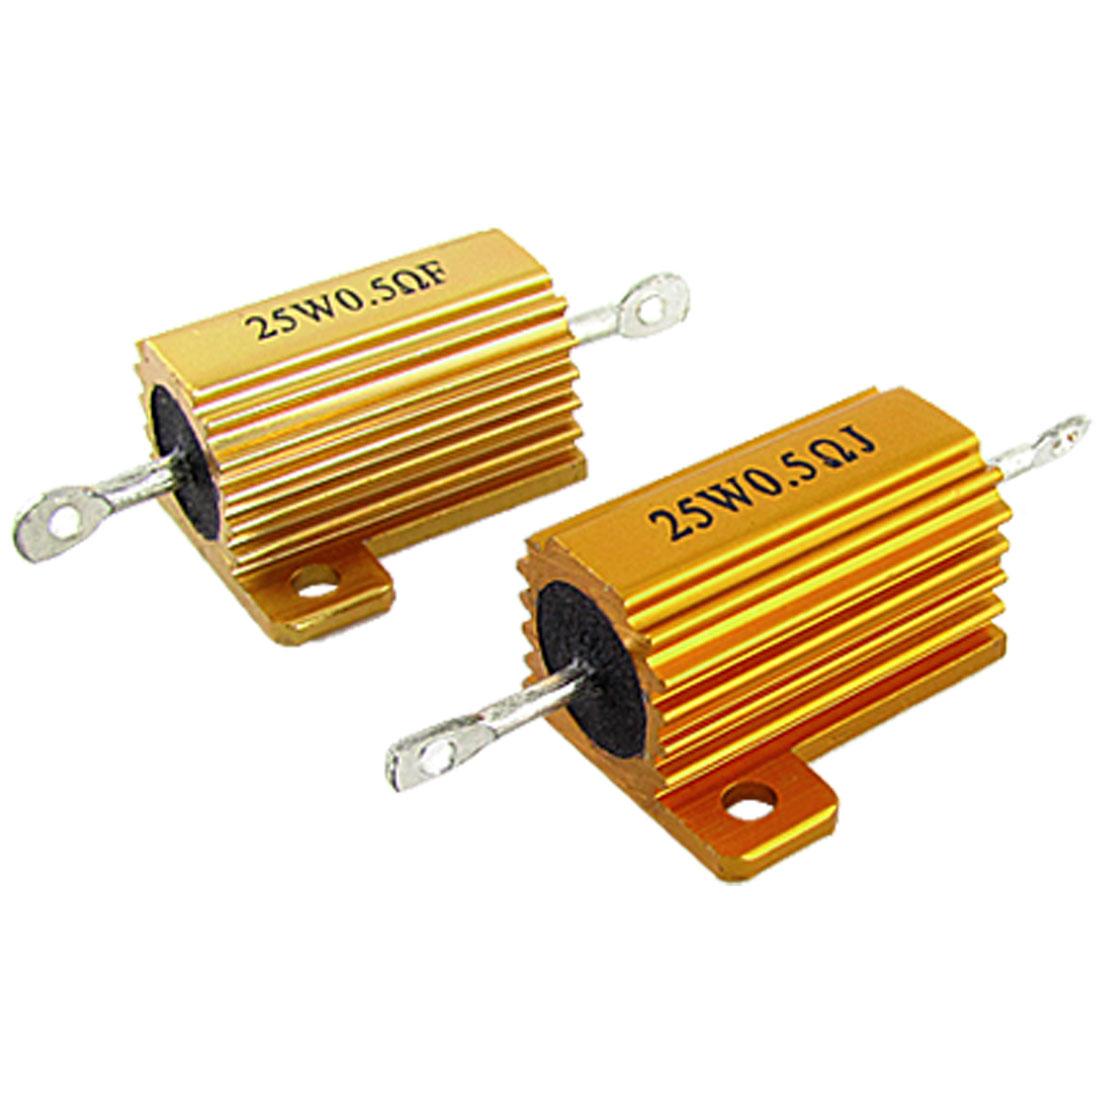 2 Pcs Gold Tone 25W 0.5 Ohm Aluminum Case Wirewound Resistors